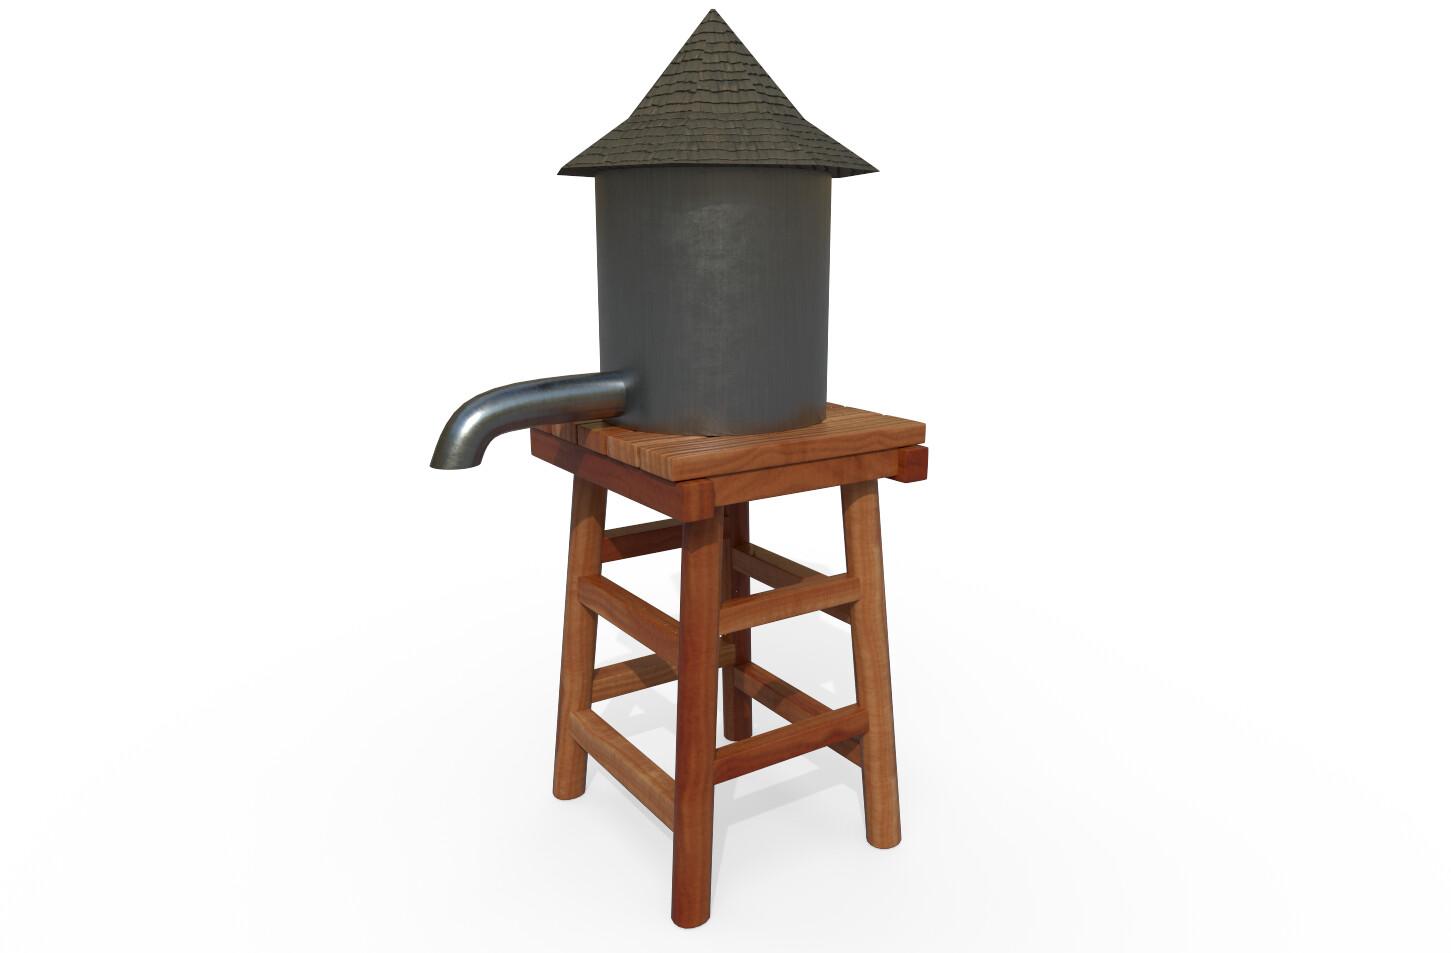 Joseph moniz watertower001d